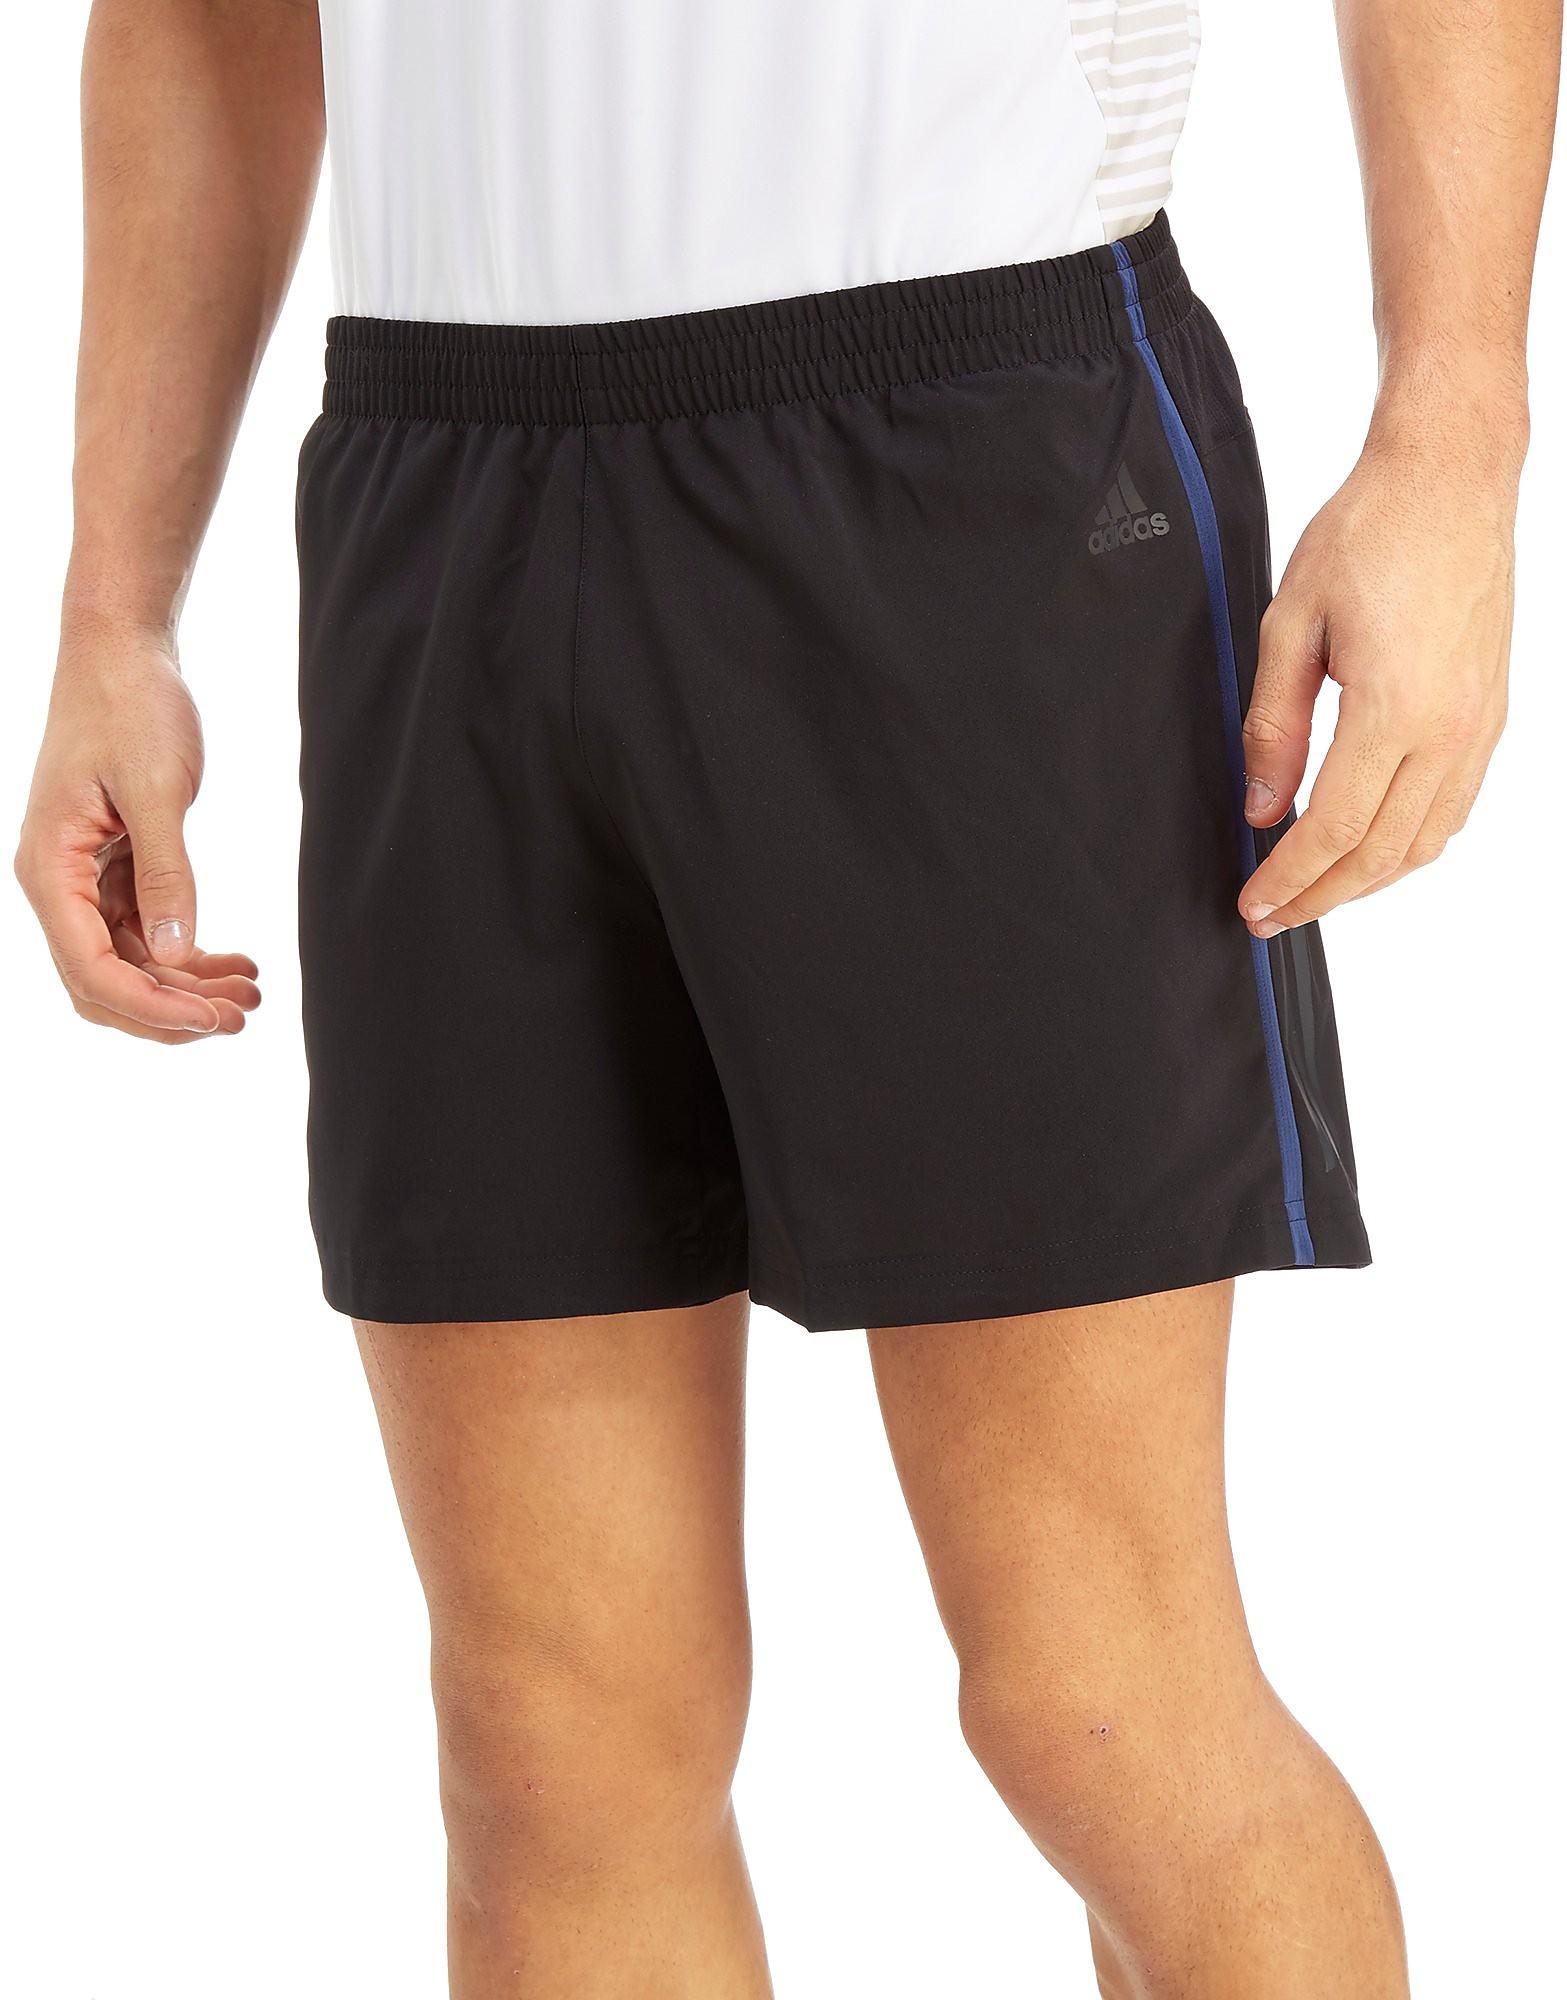 adidas pantalón corto Response 7 inch